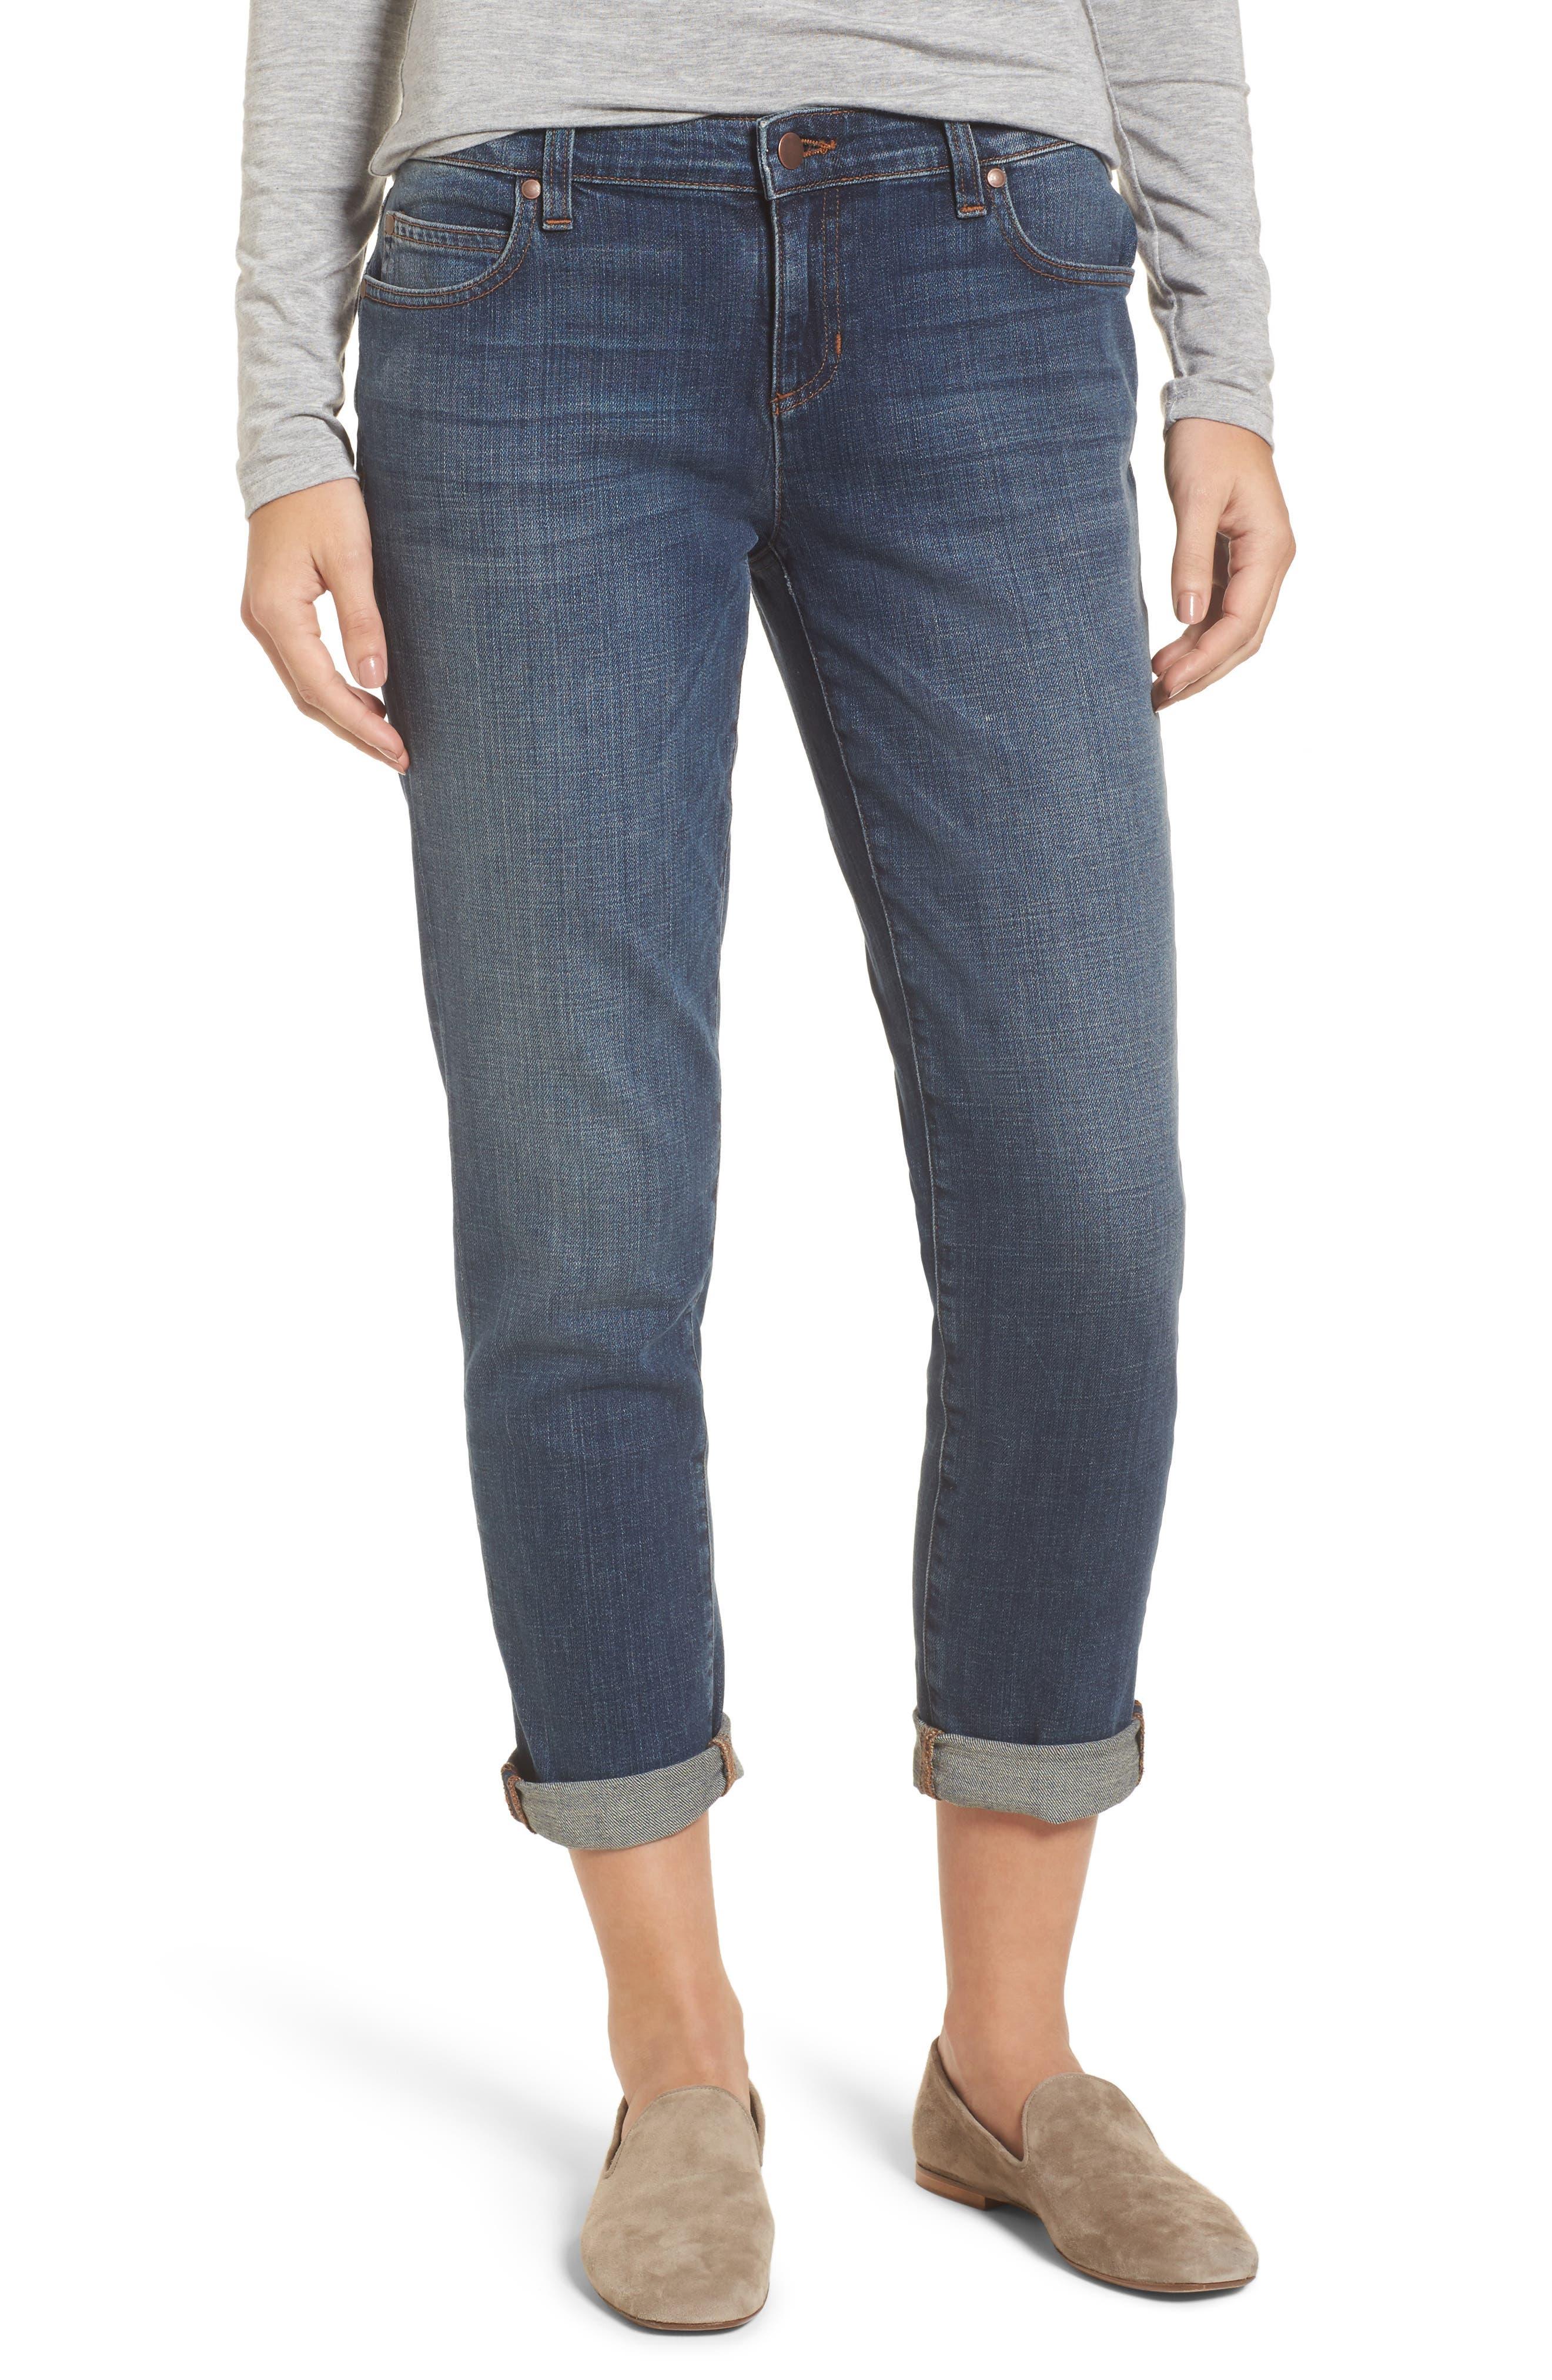 Organic Cotton Boyfriend Jeans,                         Main,                         color, Aged Indigo